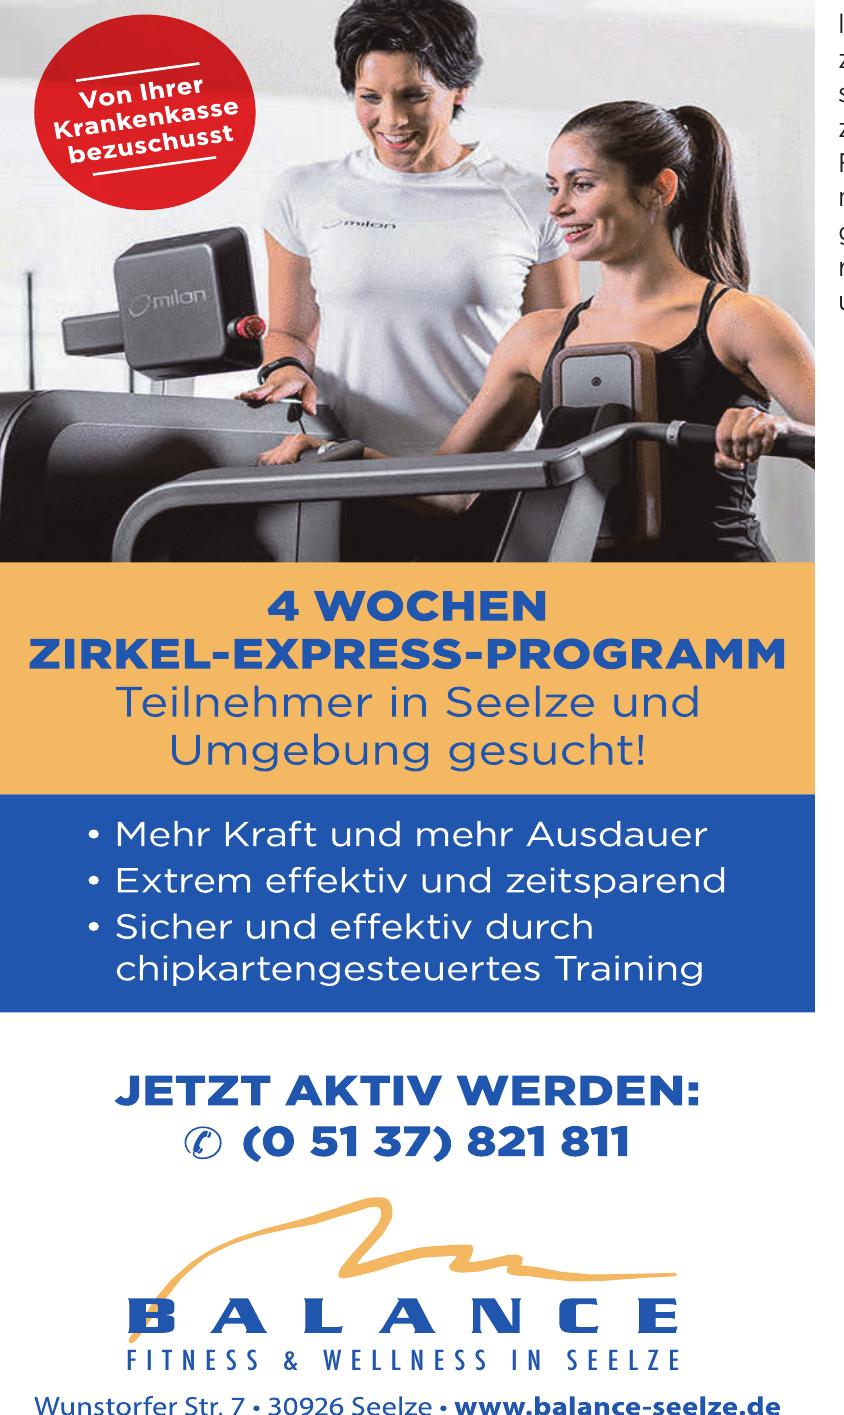 Balance Fitness & Wellness in Seelze